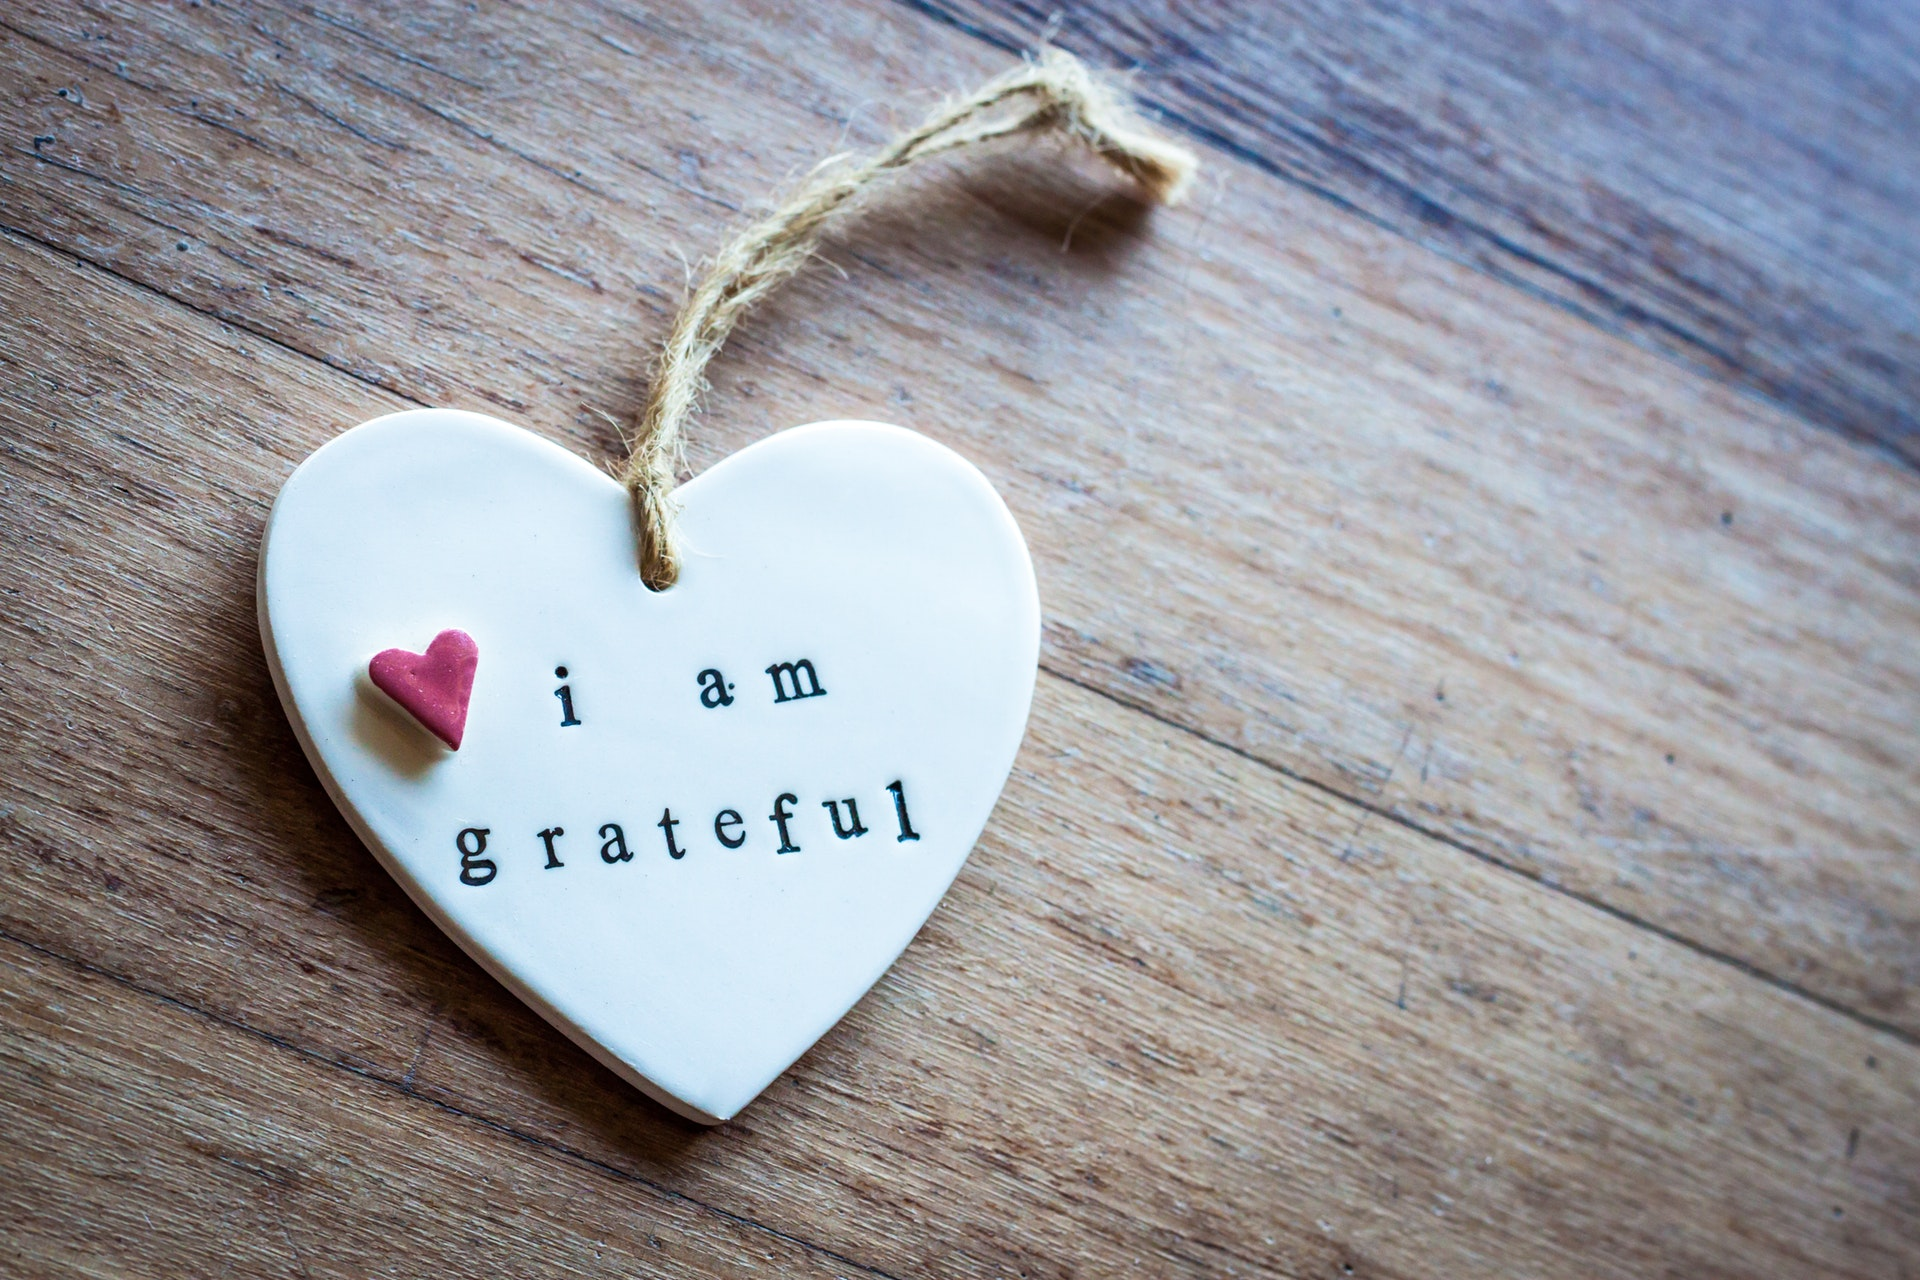 The Benefits of a Grateful Heart